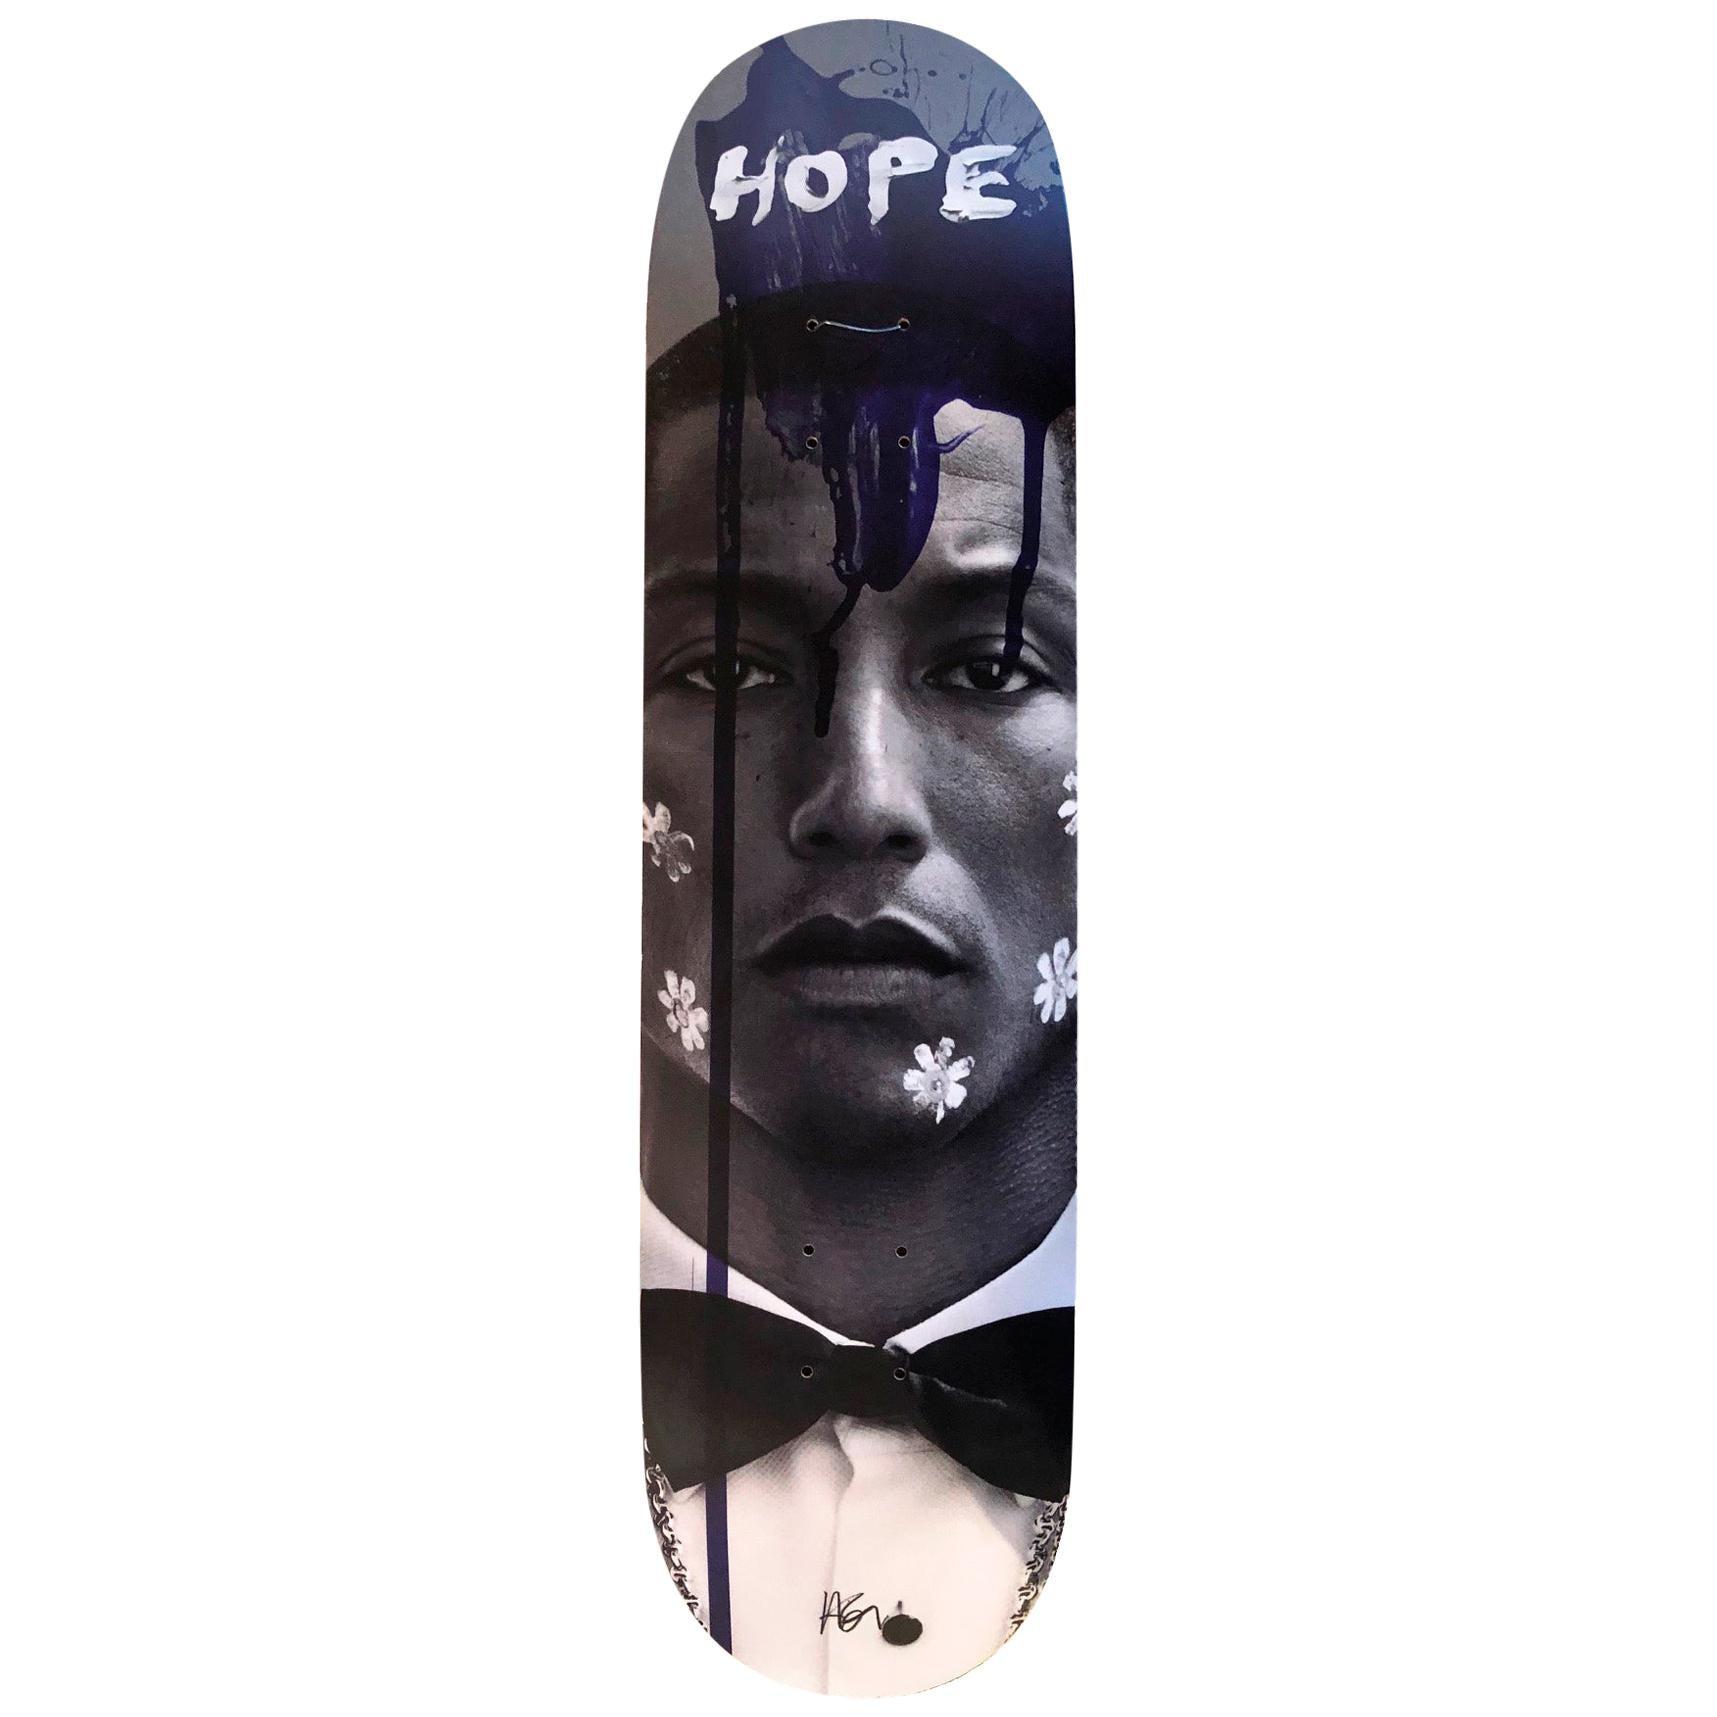 Pharrell Hope Skate Board Wall Sculpture